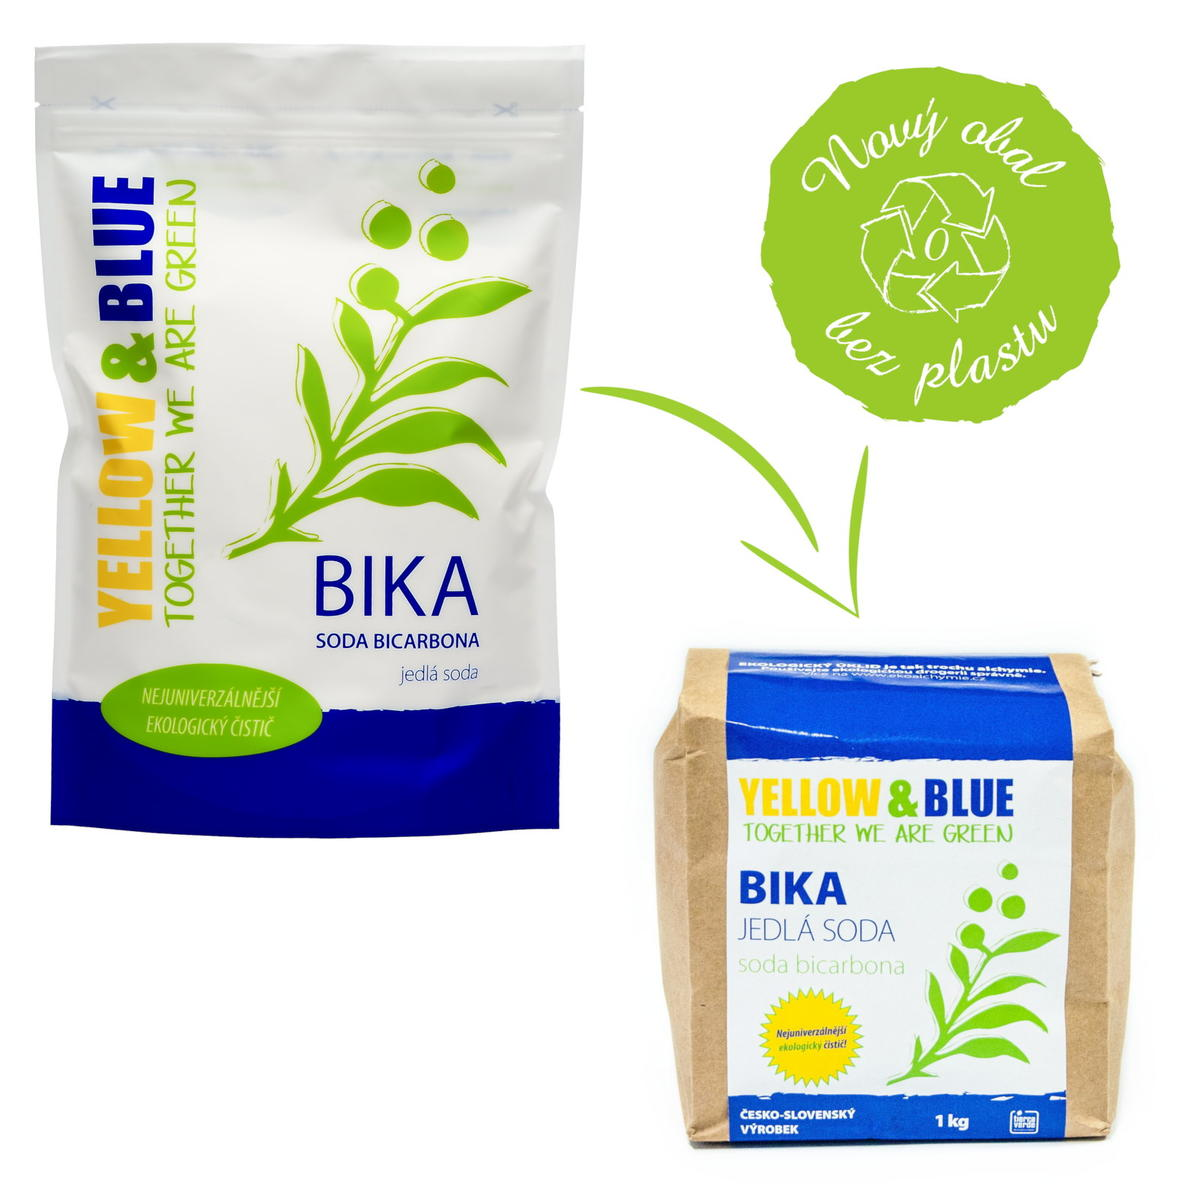 Jedlá soda BIKA (sáček 1 kg) Jedlá soda BIKA (sáček 1 kg)